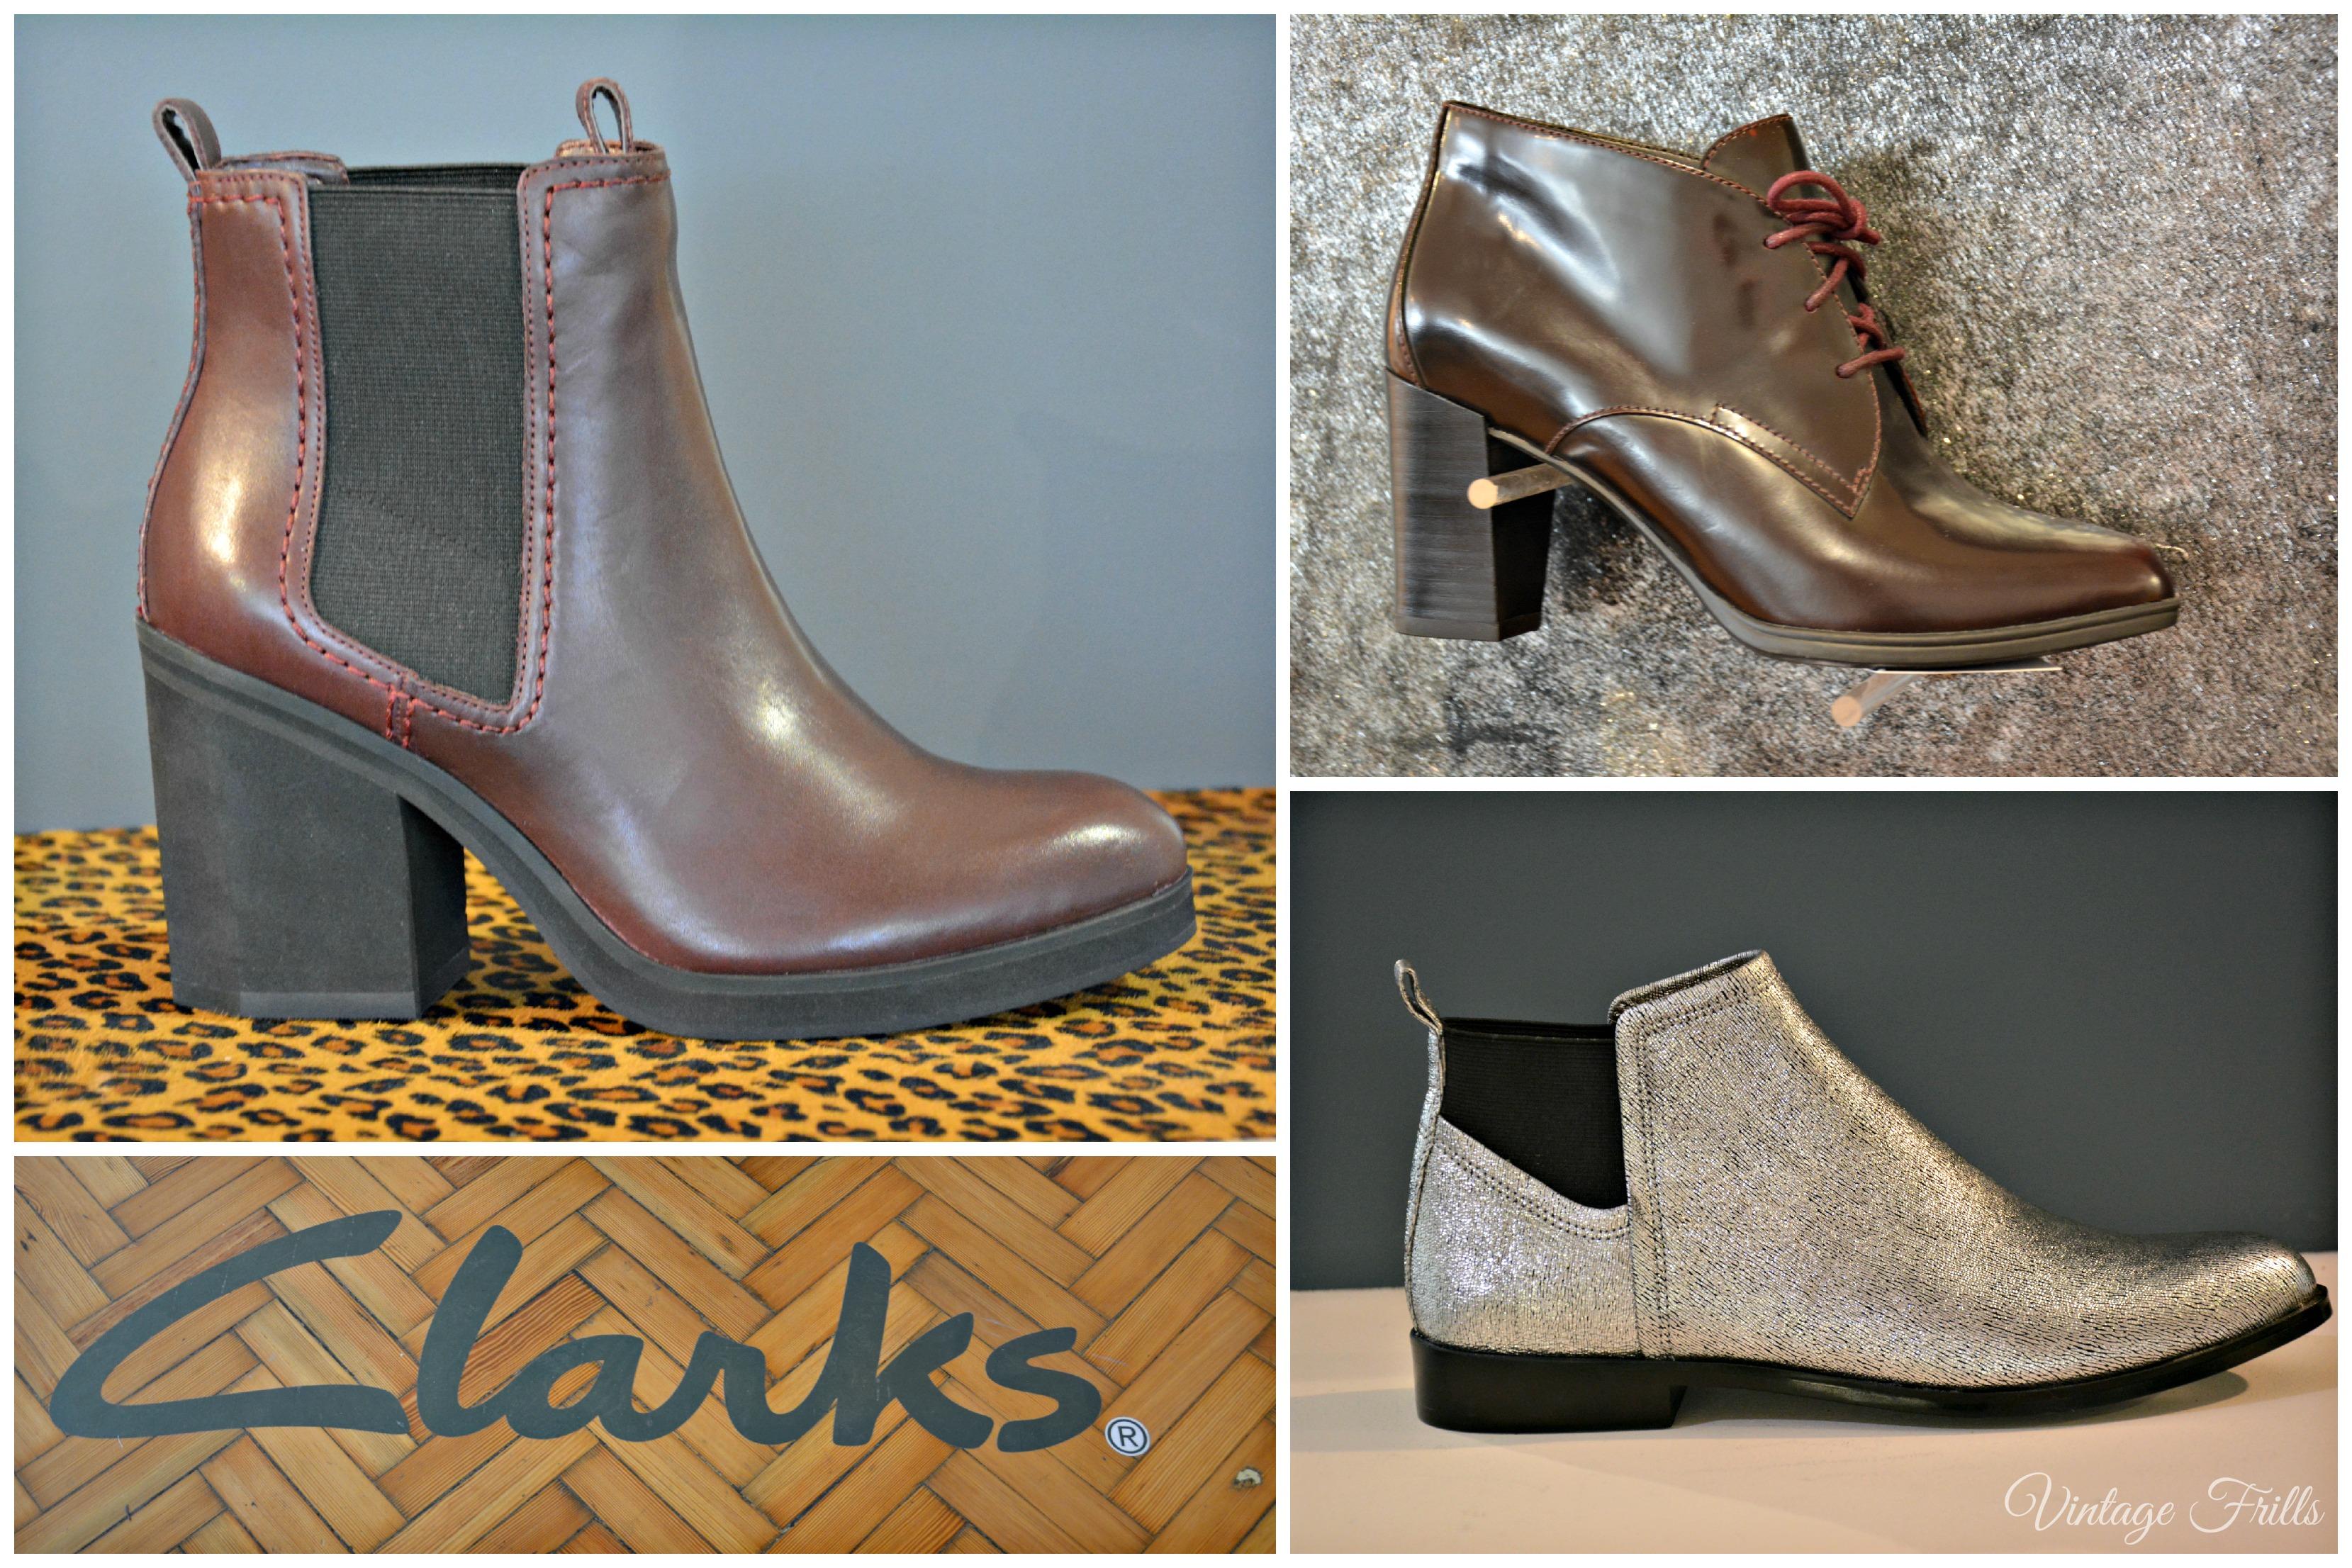 Clarks AW15 Press Day • Vintage Frills